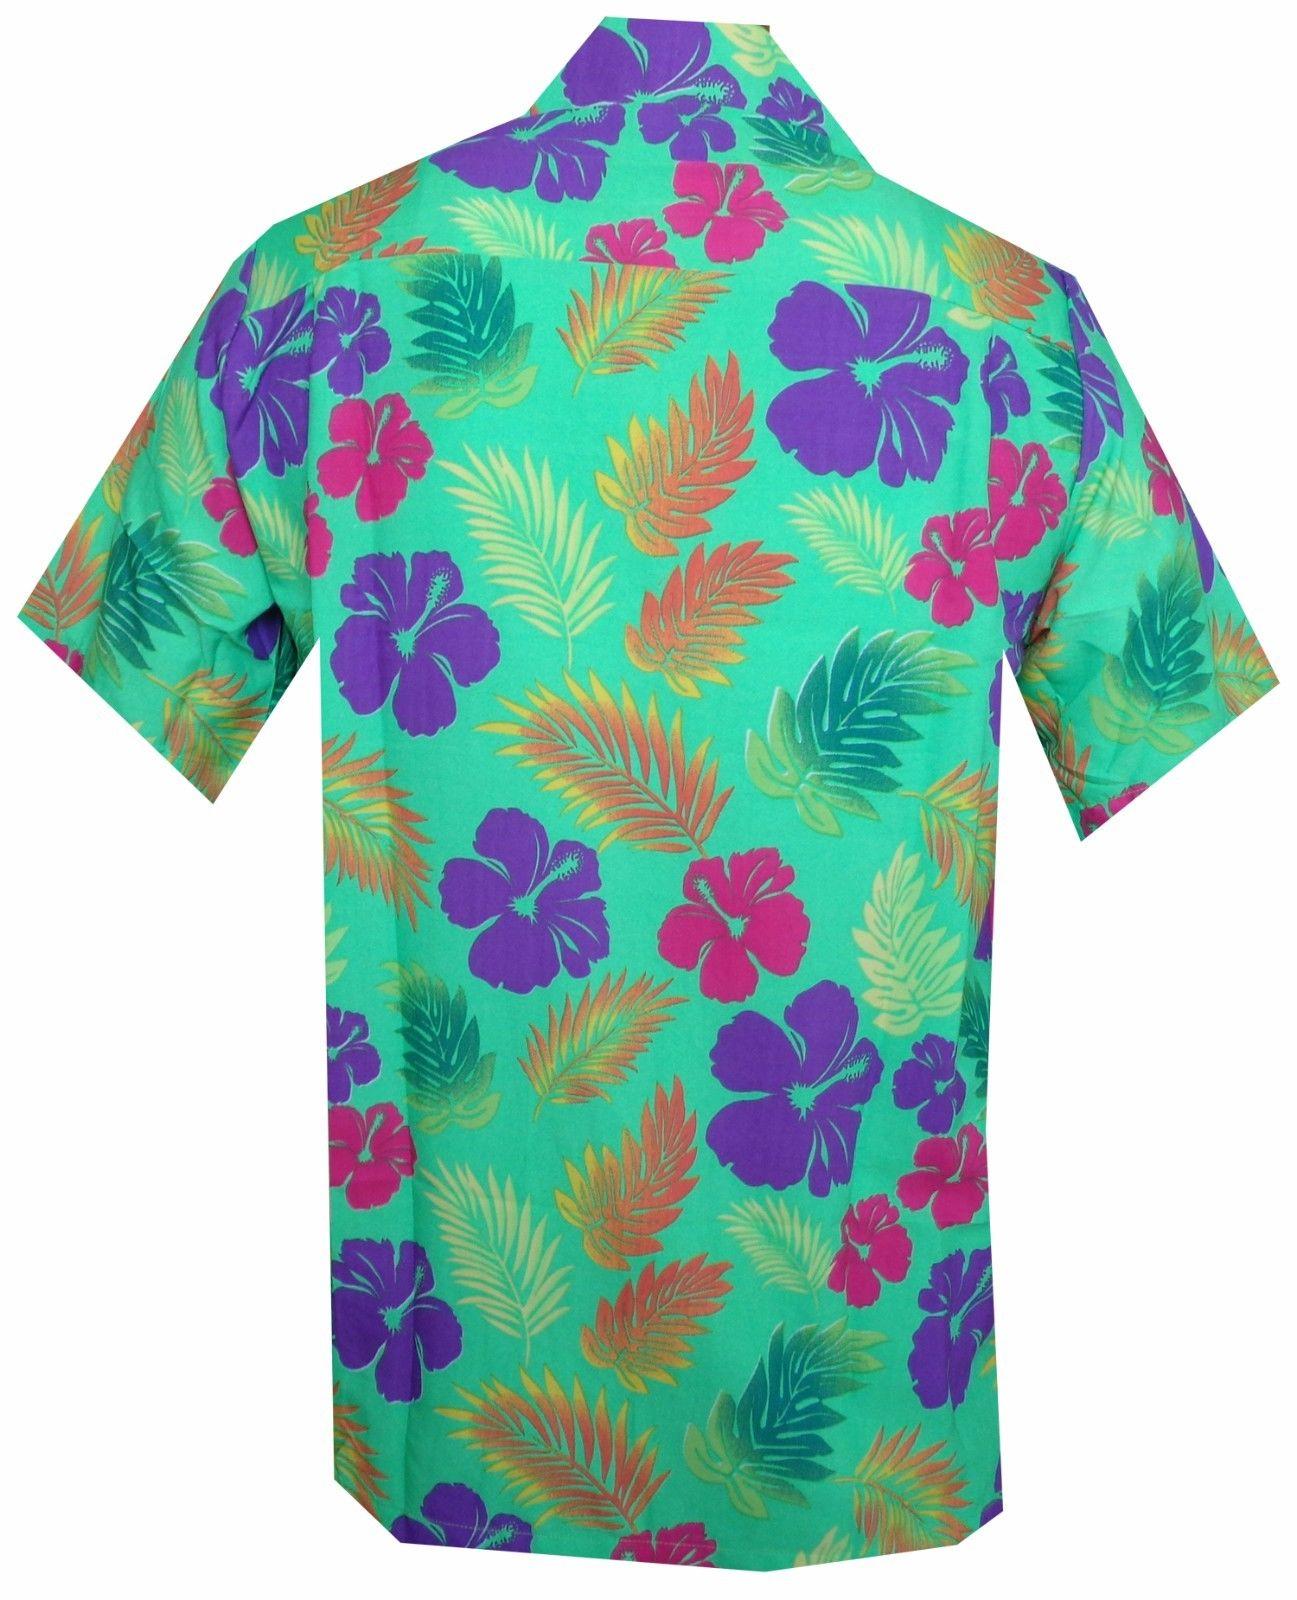 Hawaiian-Shirt-Mens-Hibiscus-Floral-Leaf-Print-Beach-Aloha-Camp-Party thumbnail 5